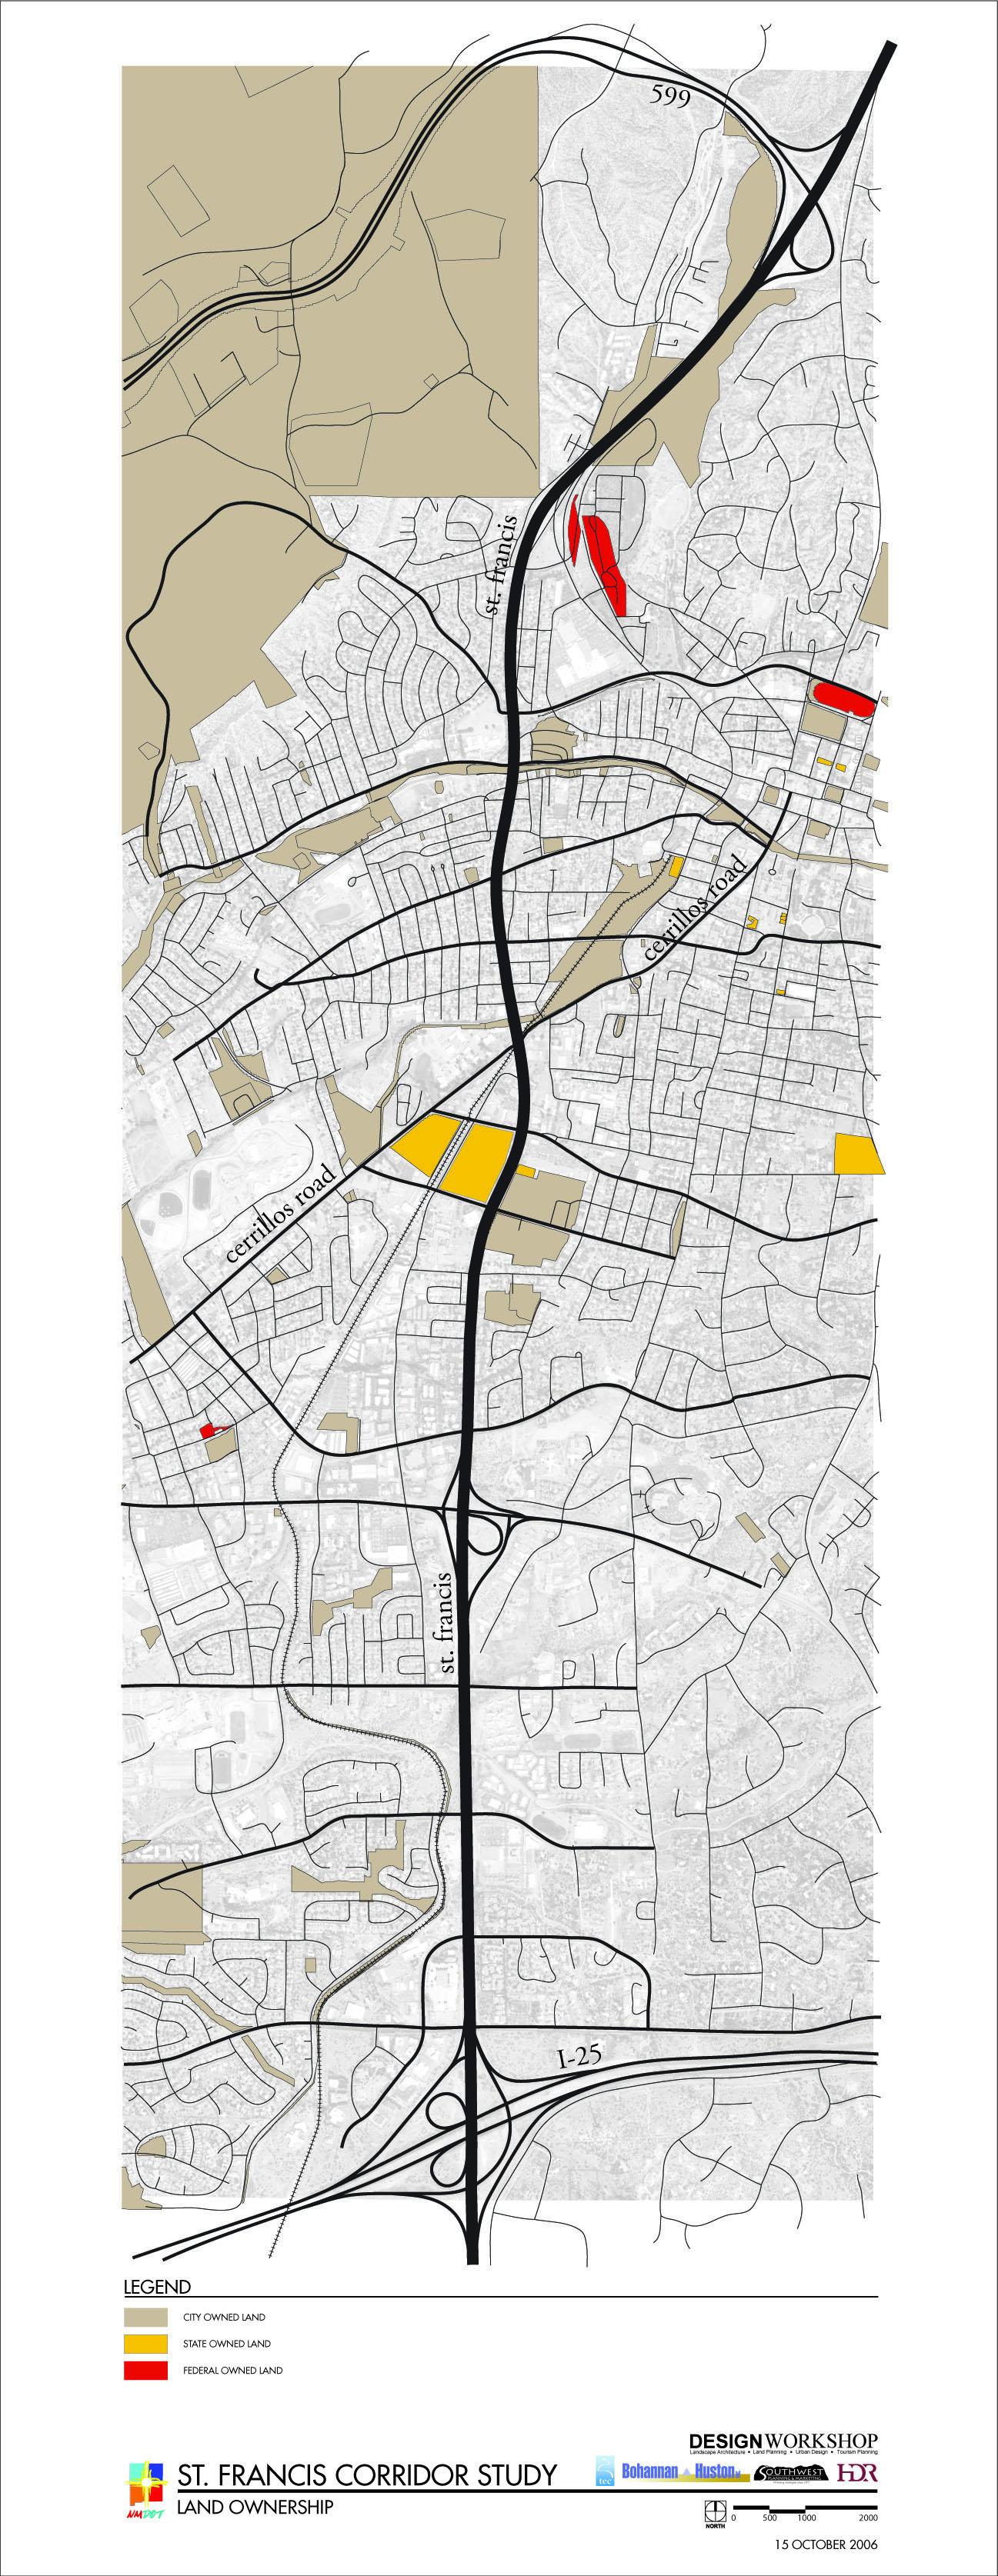 sfc_diagrams_land-ownership.jpg